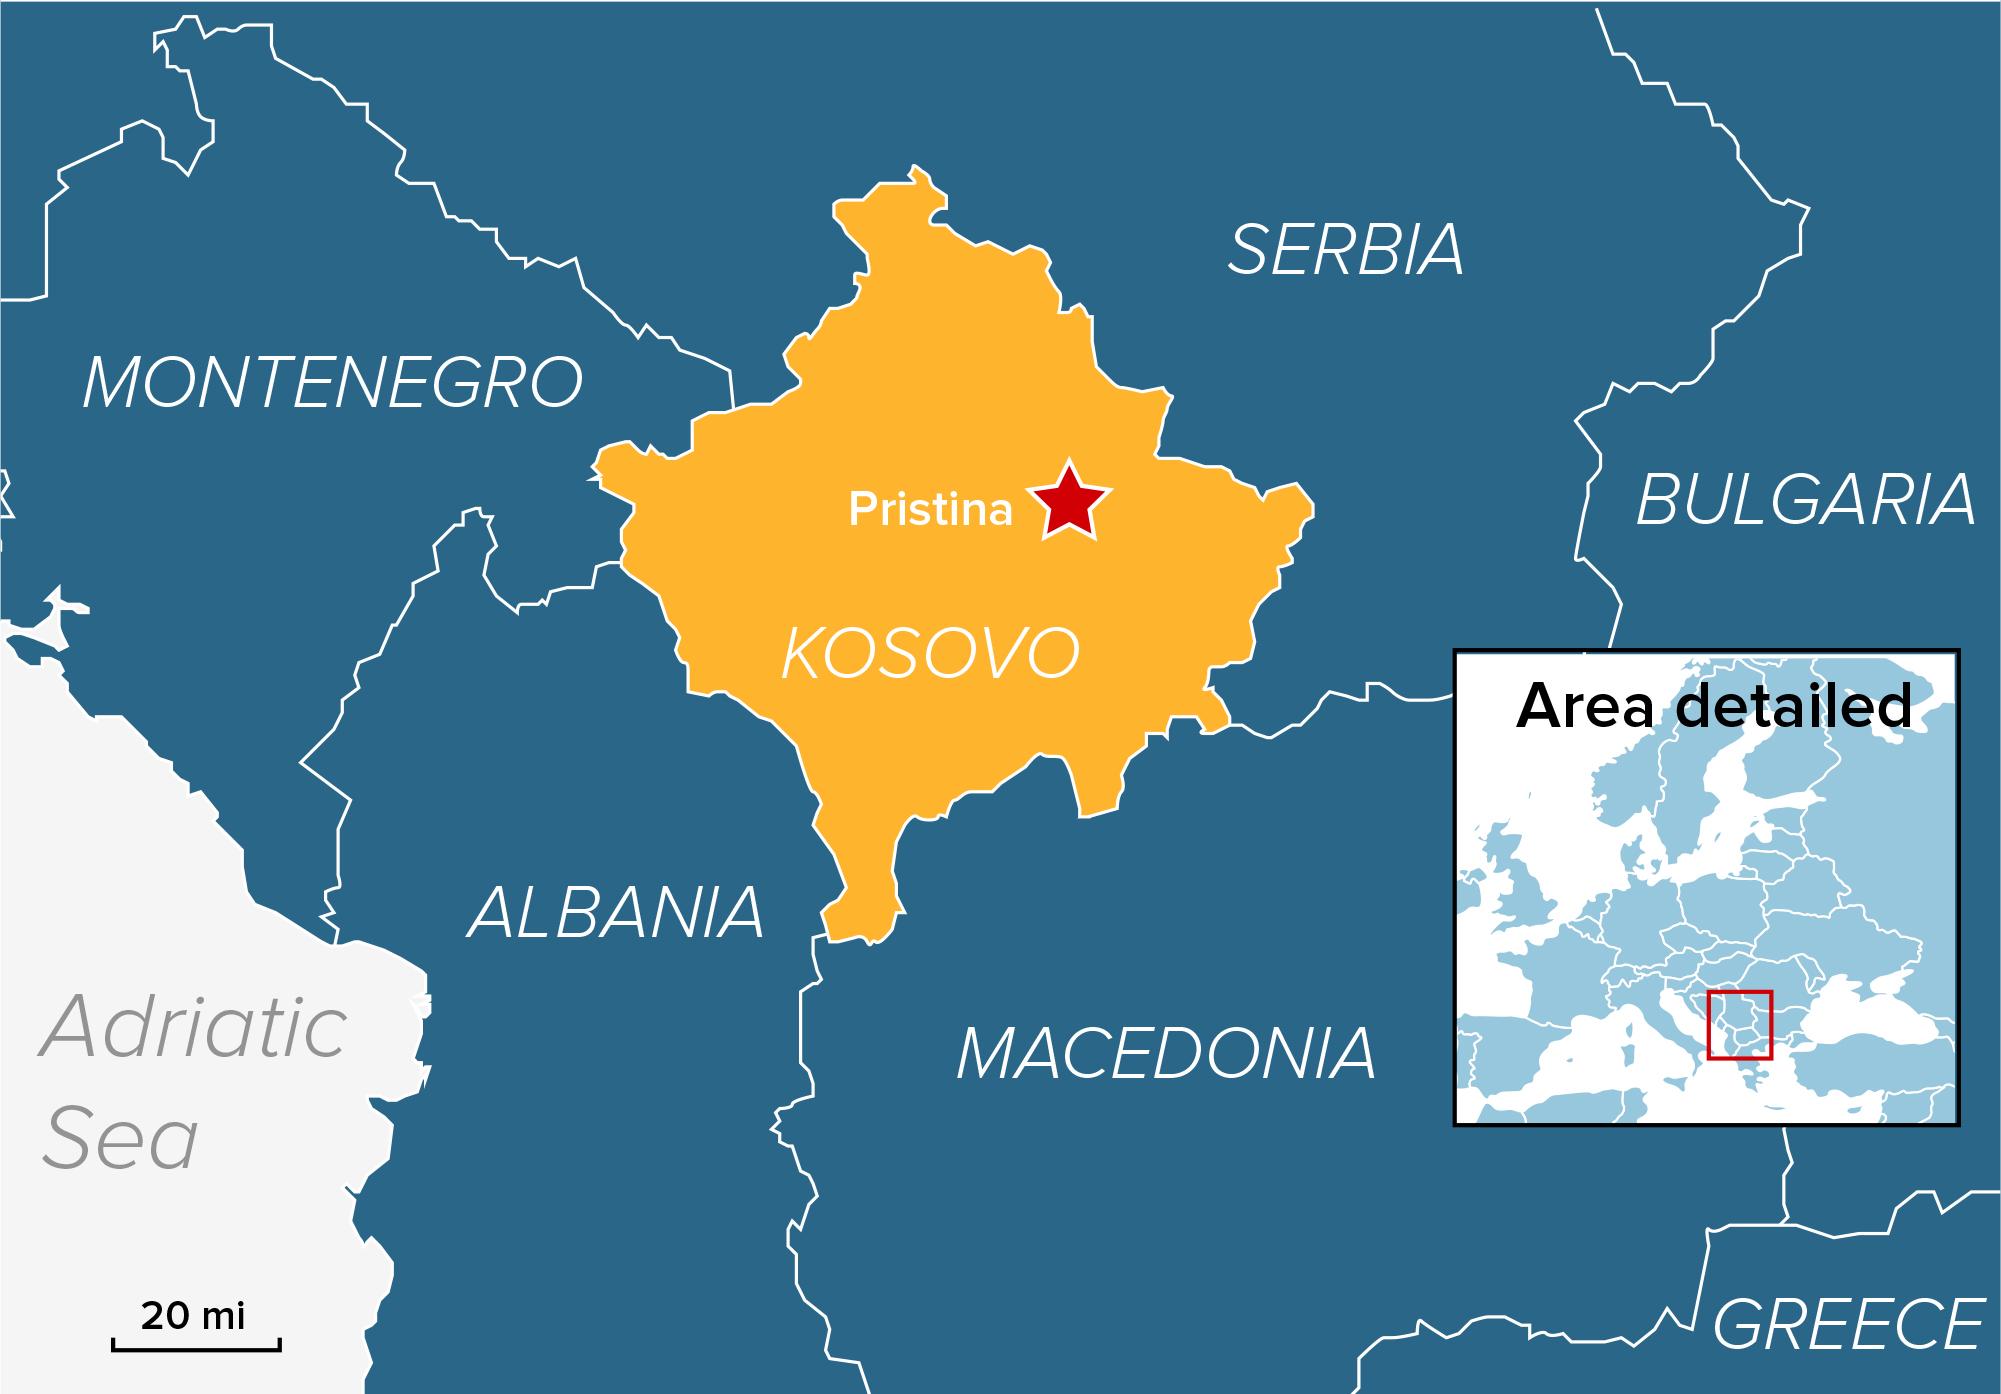 Image: Map of Kosovo